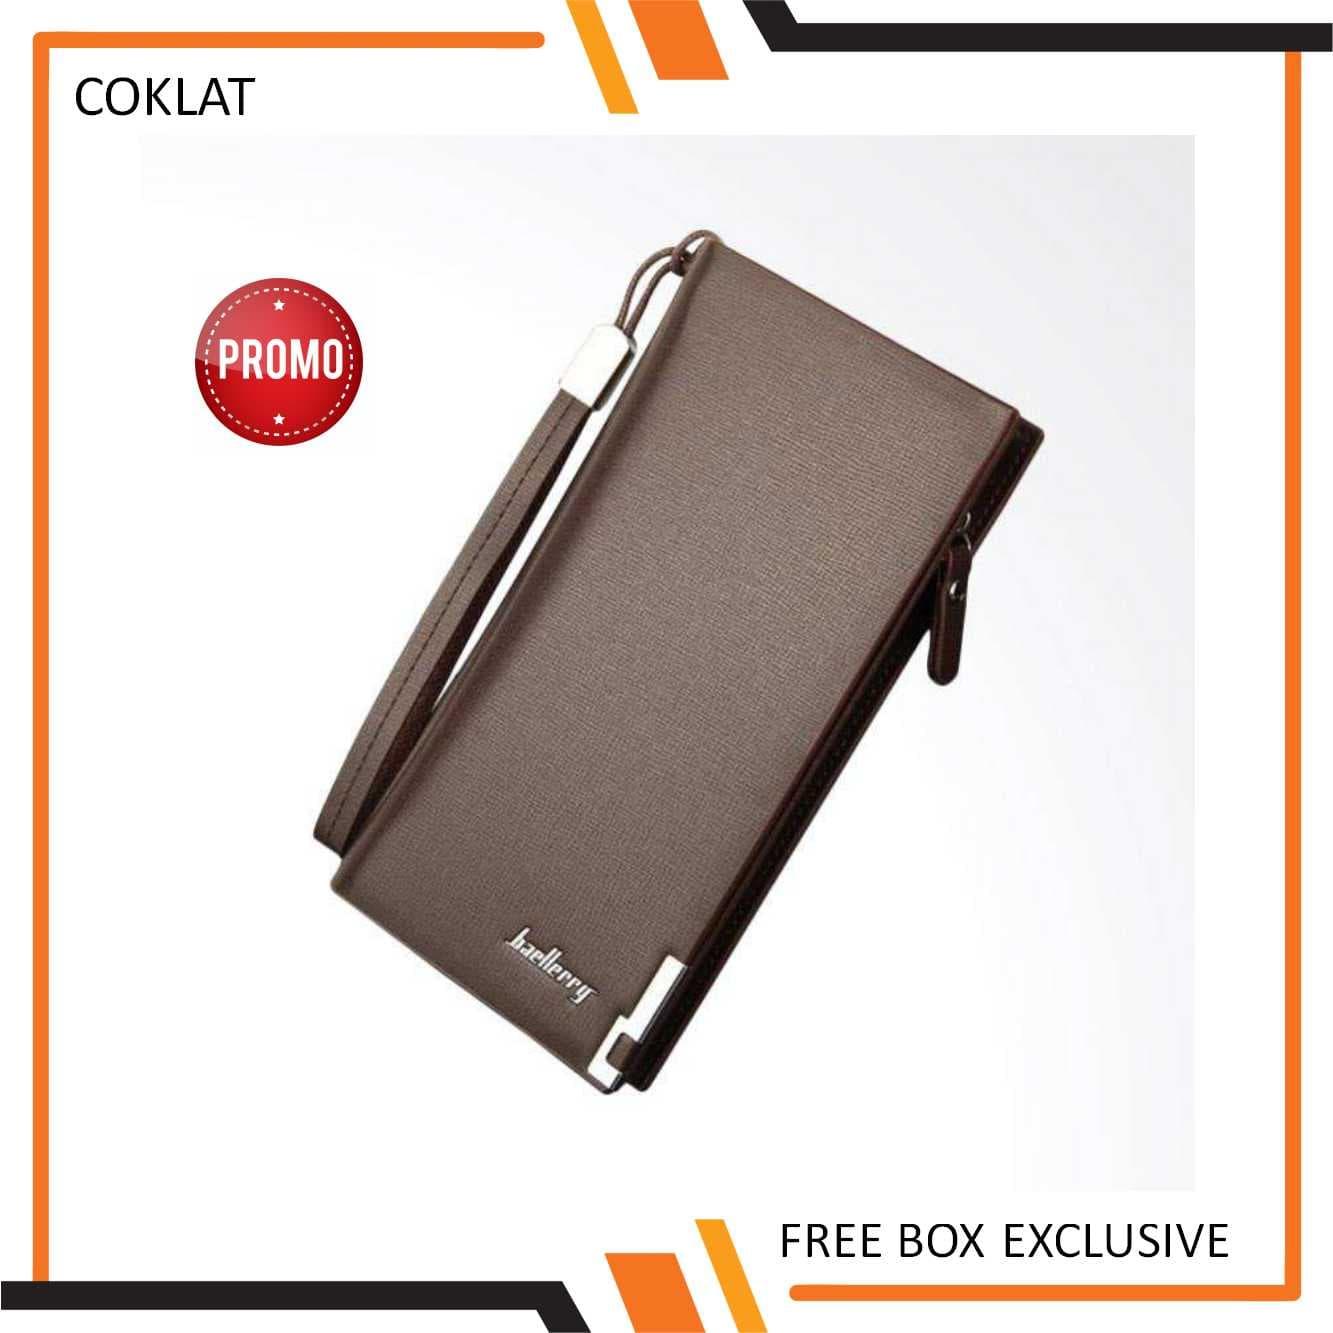 Harga Dompet Pria Branded Terbaru 2018 Kulit Asli Bifold Wallet Mens Import  Ragazzo Dkr 006 Baellerry High Quality Premium Leather